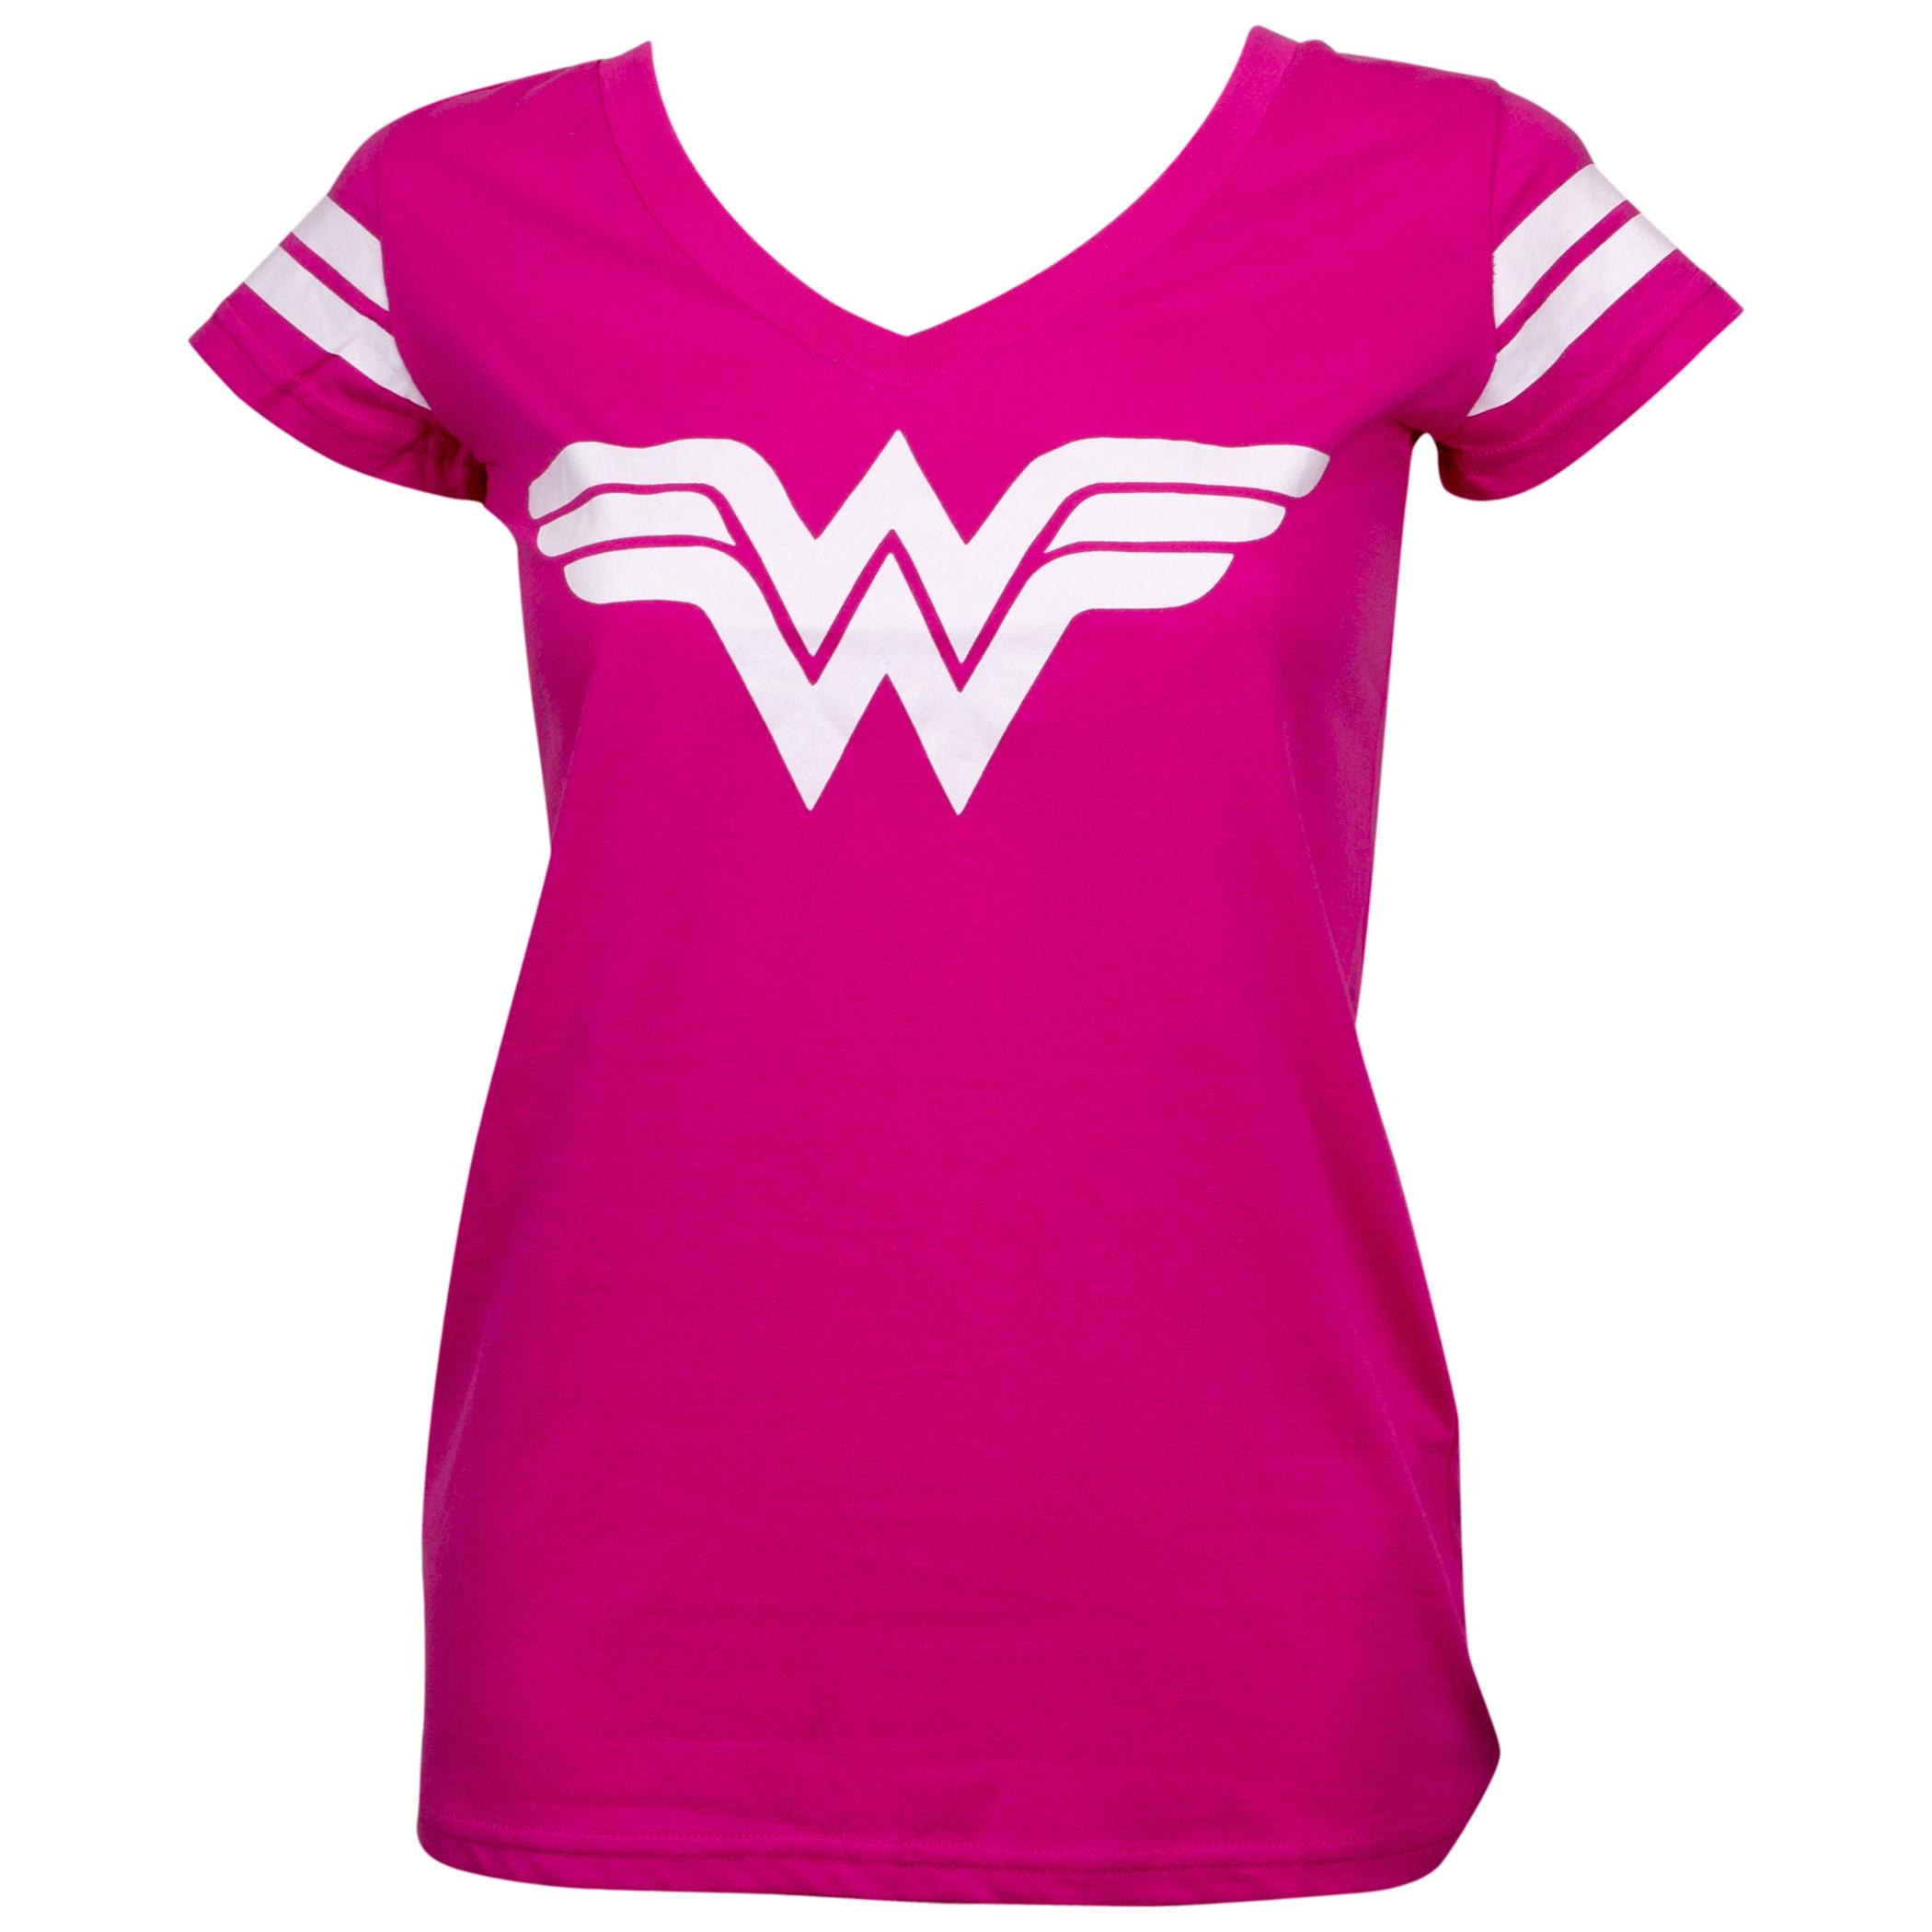 Wonder Woman Logo Hot Pink V-Neck T-Shirt with Sleeve Stripes